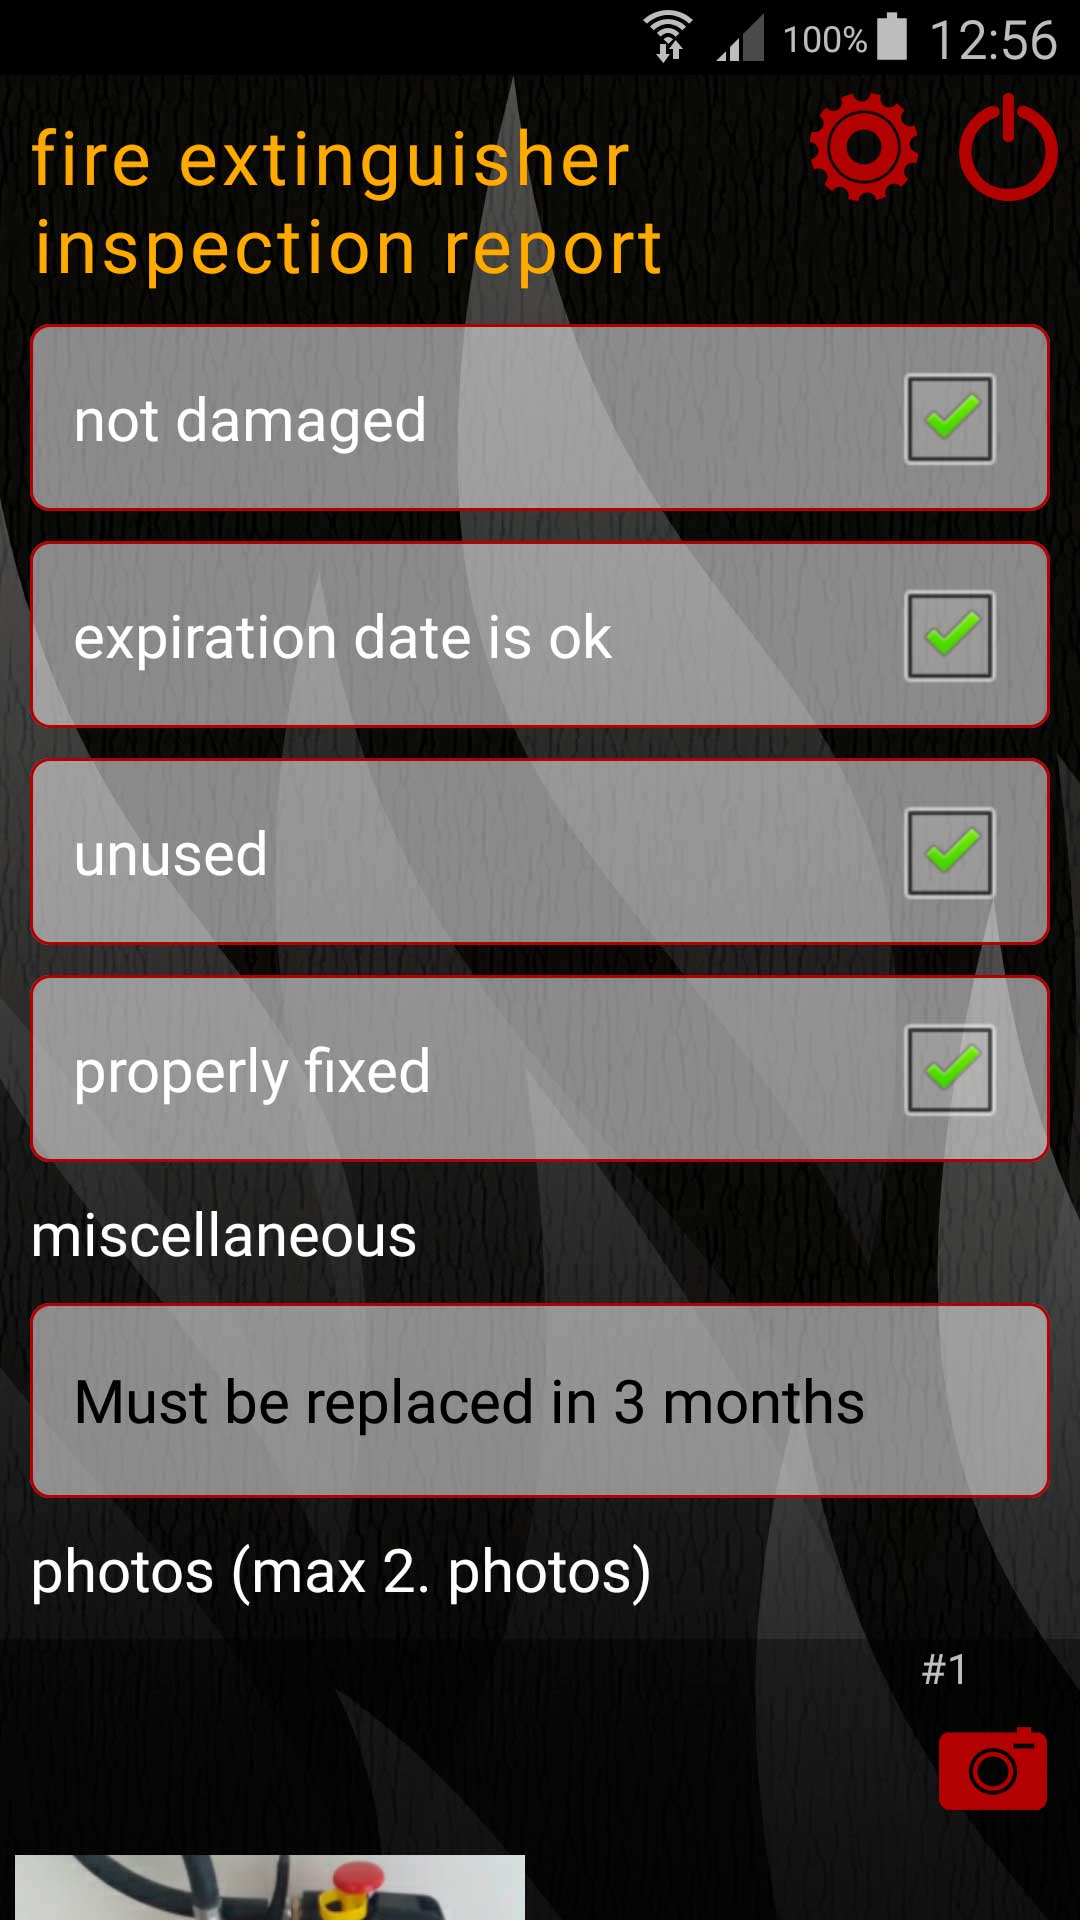 ginstr_app_fireExtinguisherInspectionReport_EN_3